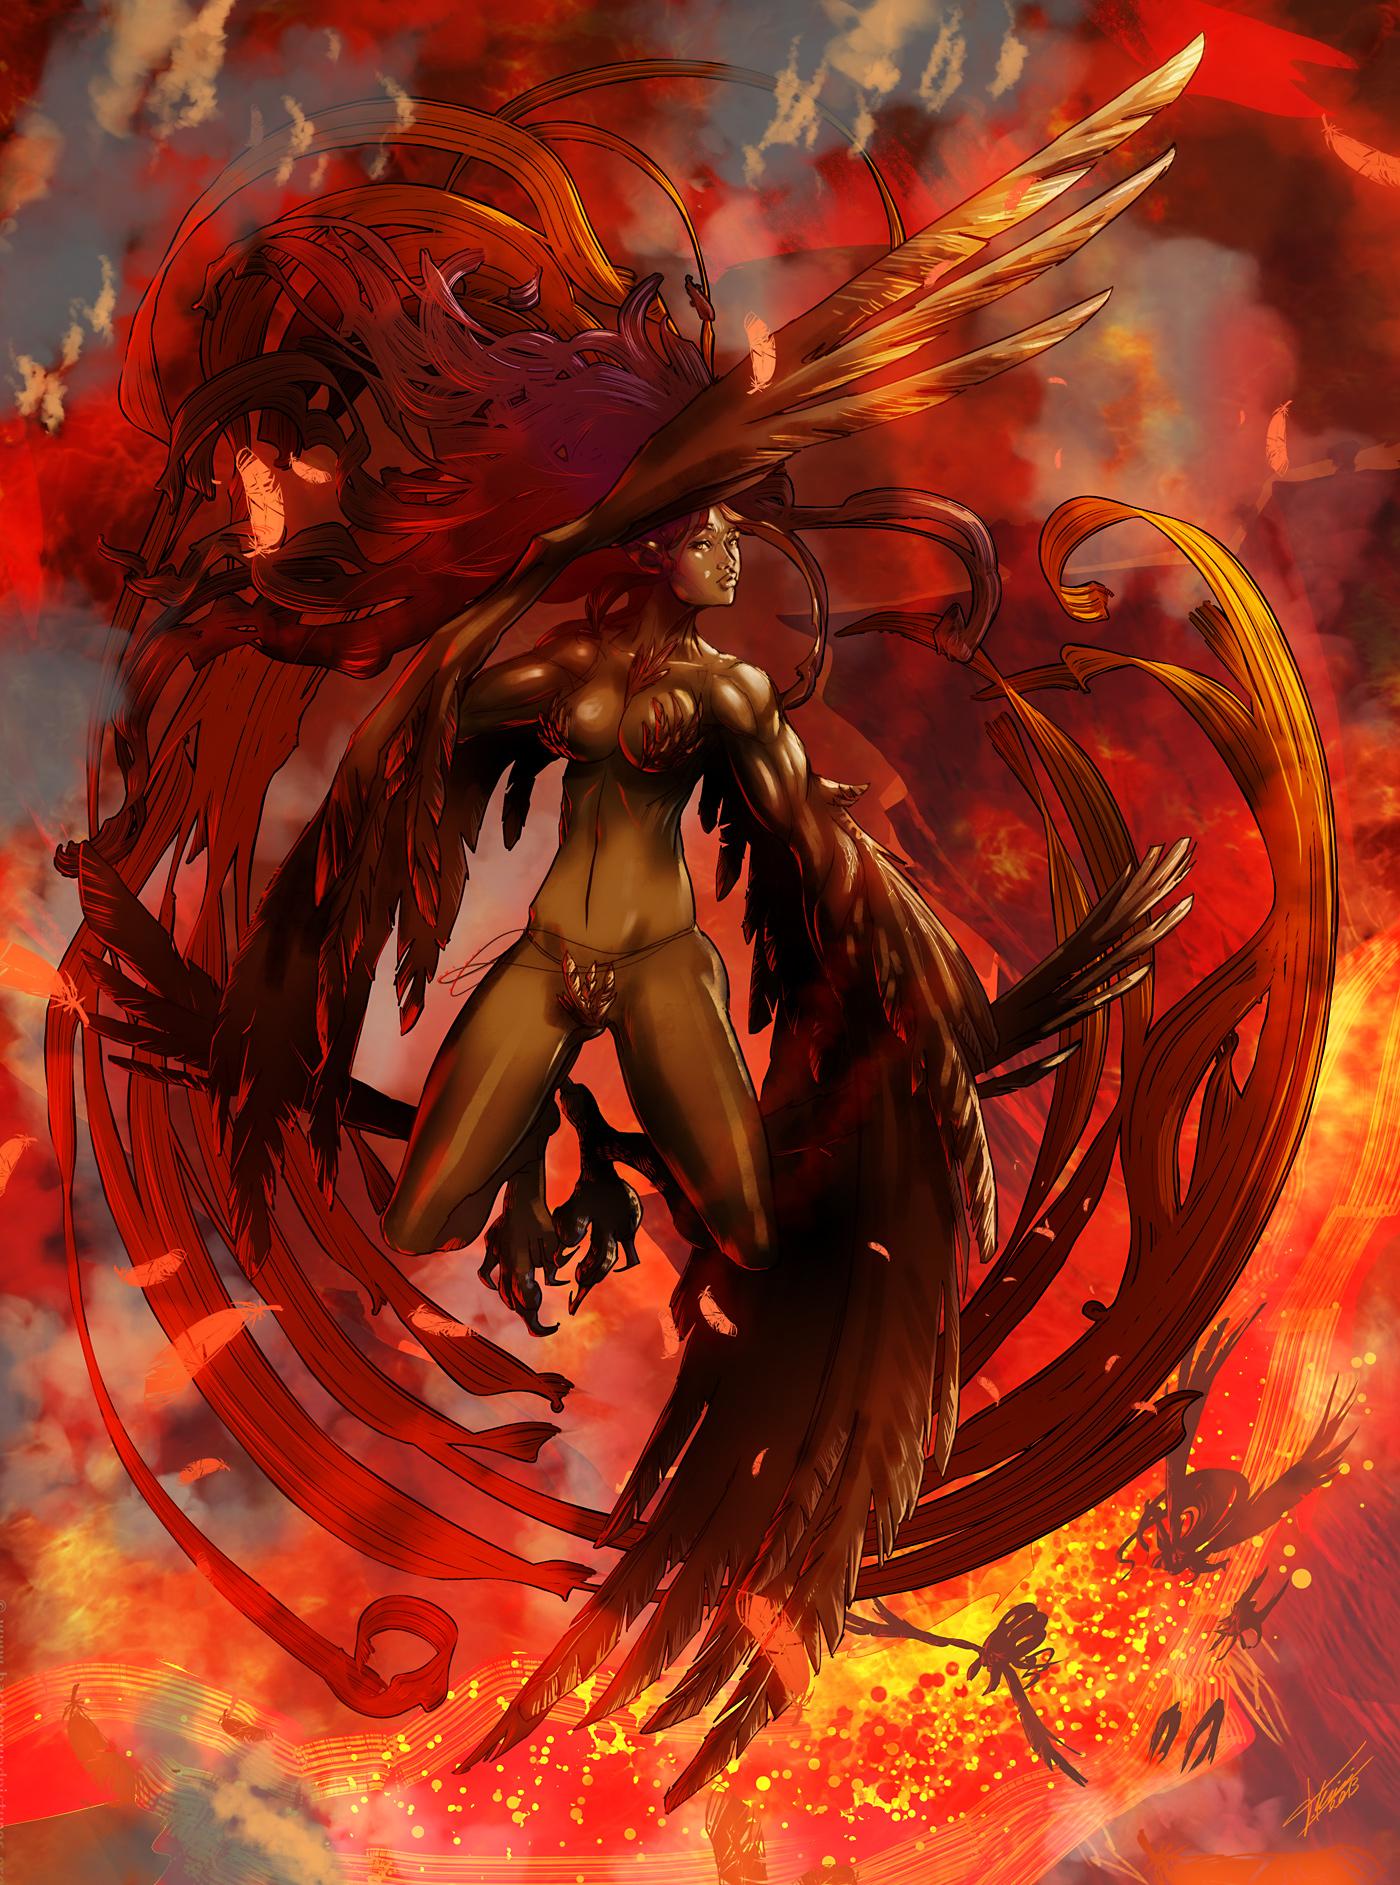 Harpy Phoenix by tommasorenieri